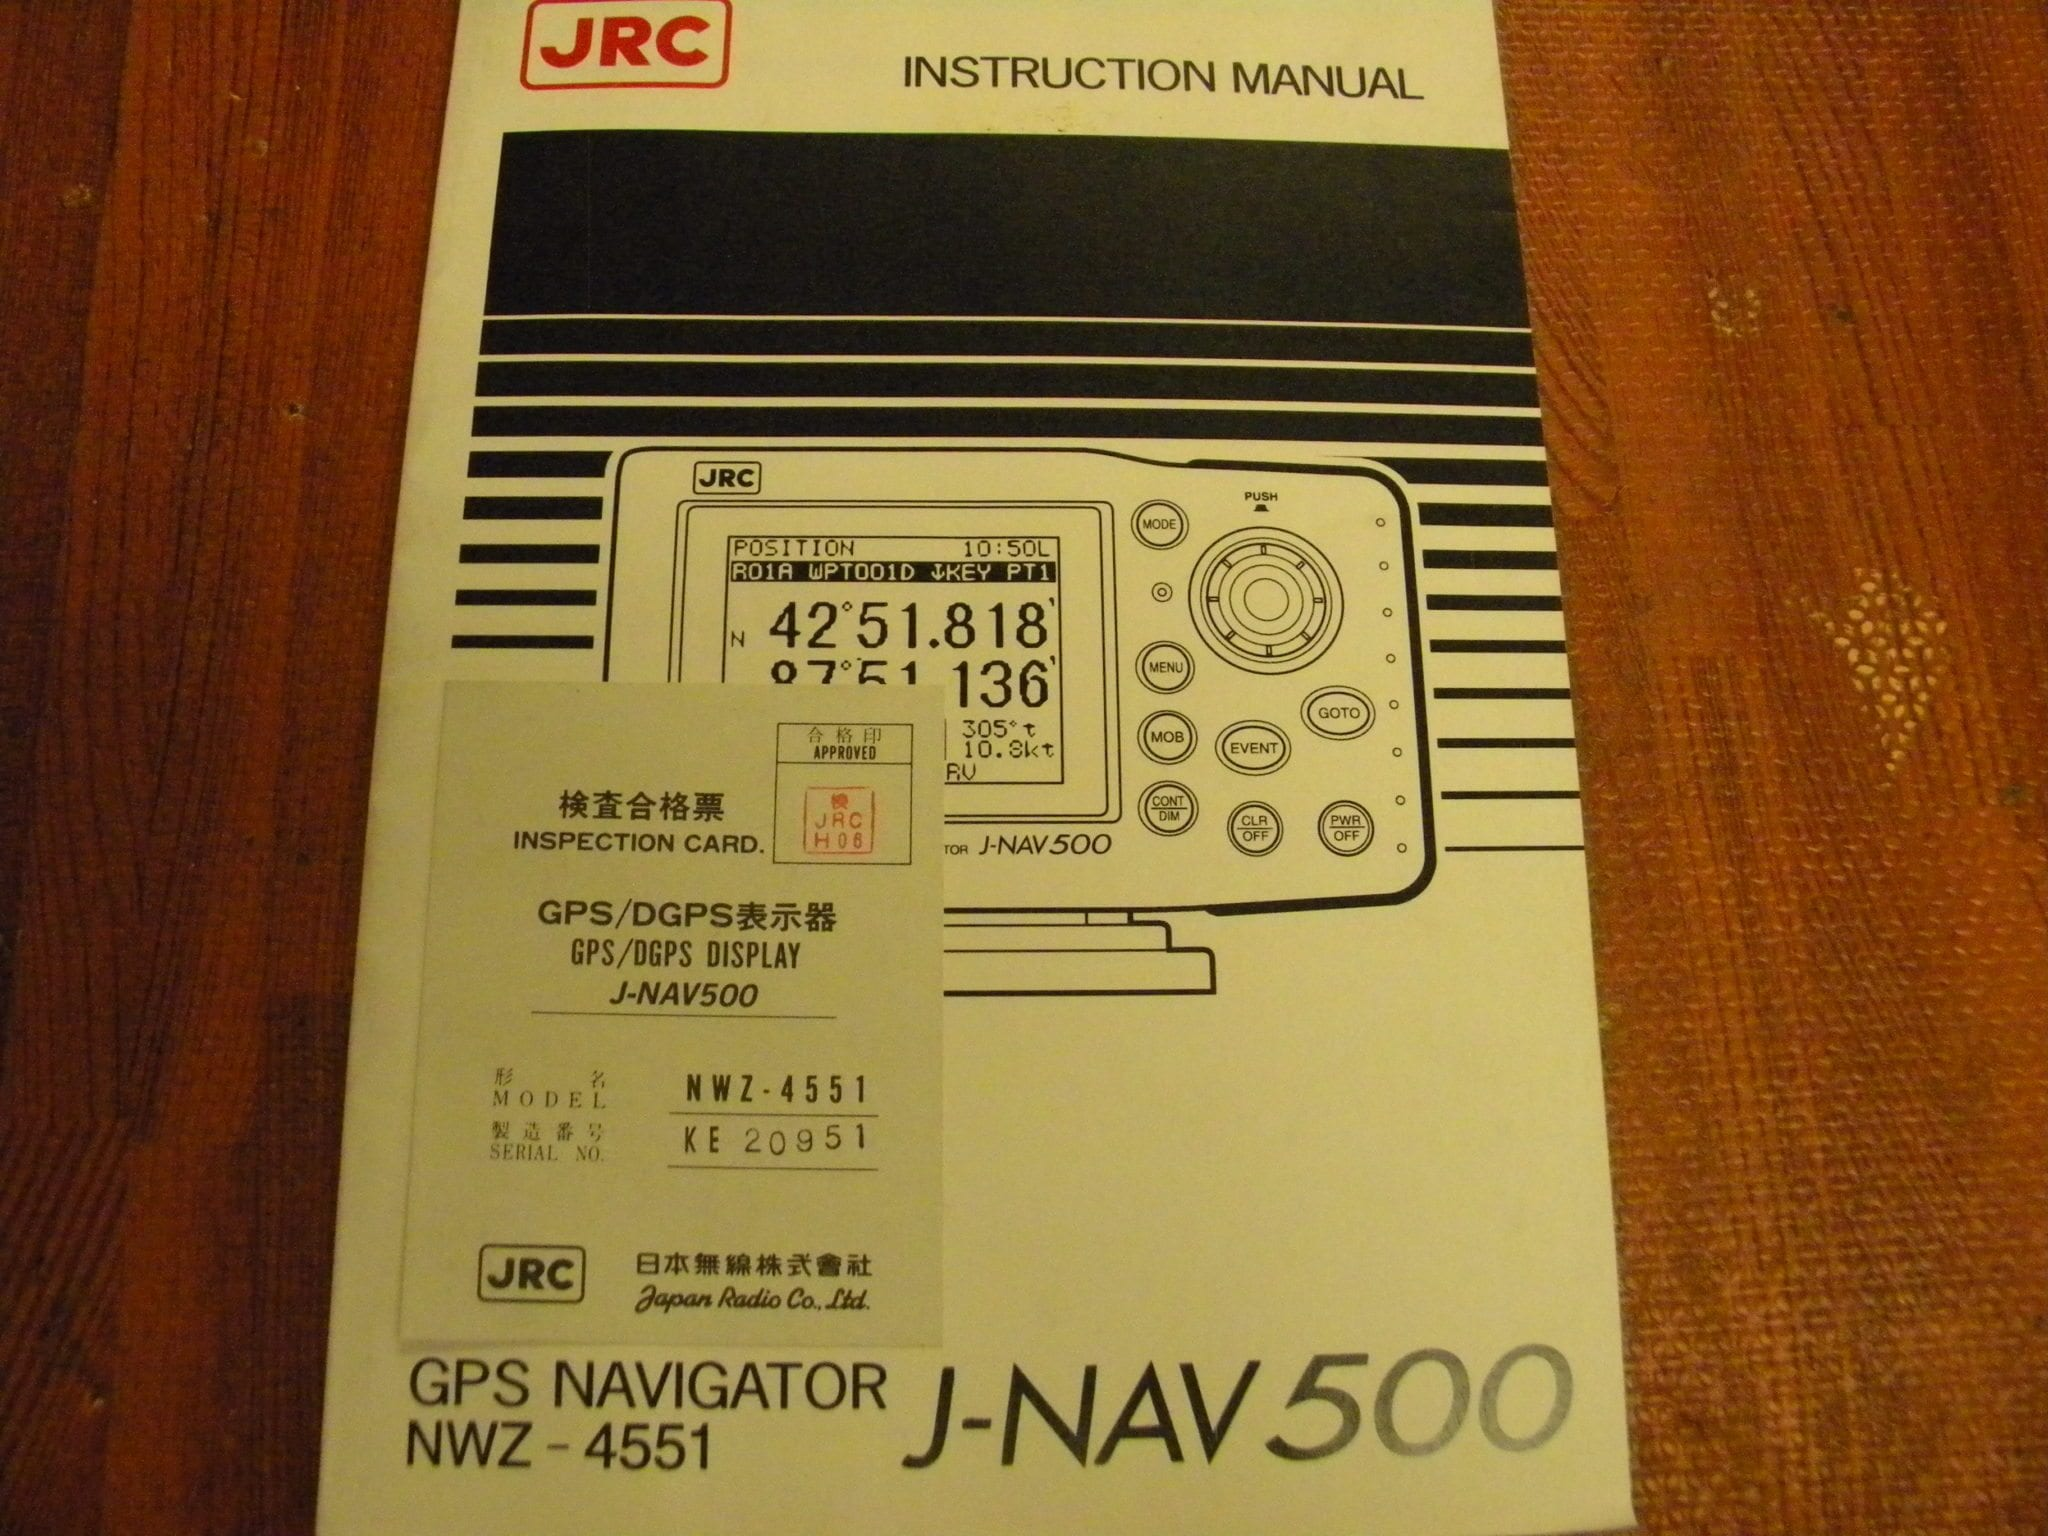 jrc gps navigator nwz 4551 j nav 500 instruction manual max marine rh maxmarineelectronics com Trimble GPS GPS Estimated Position Error